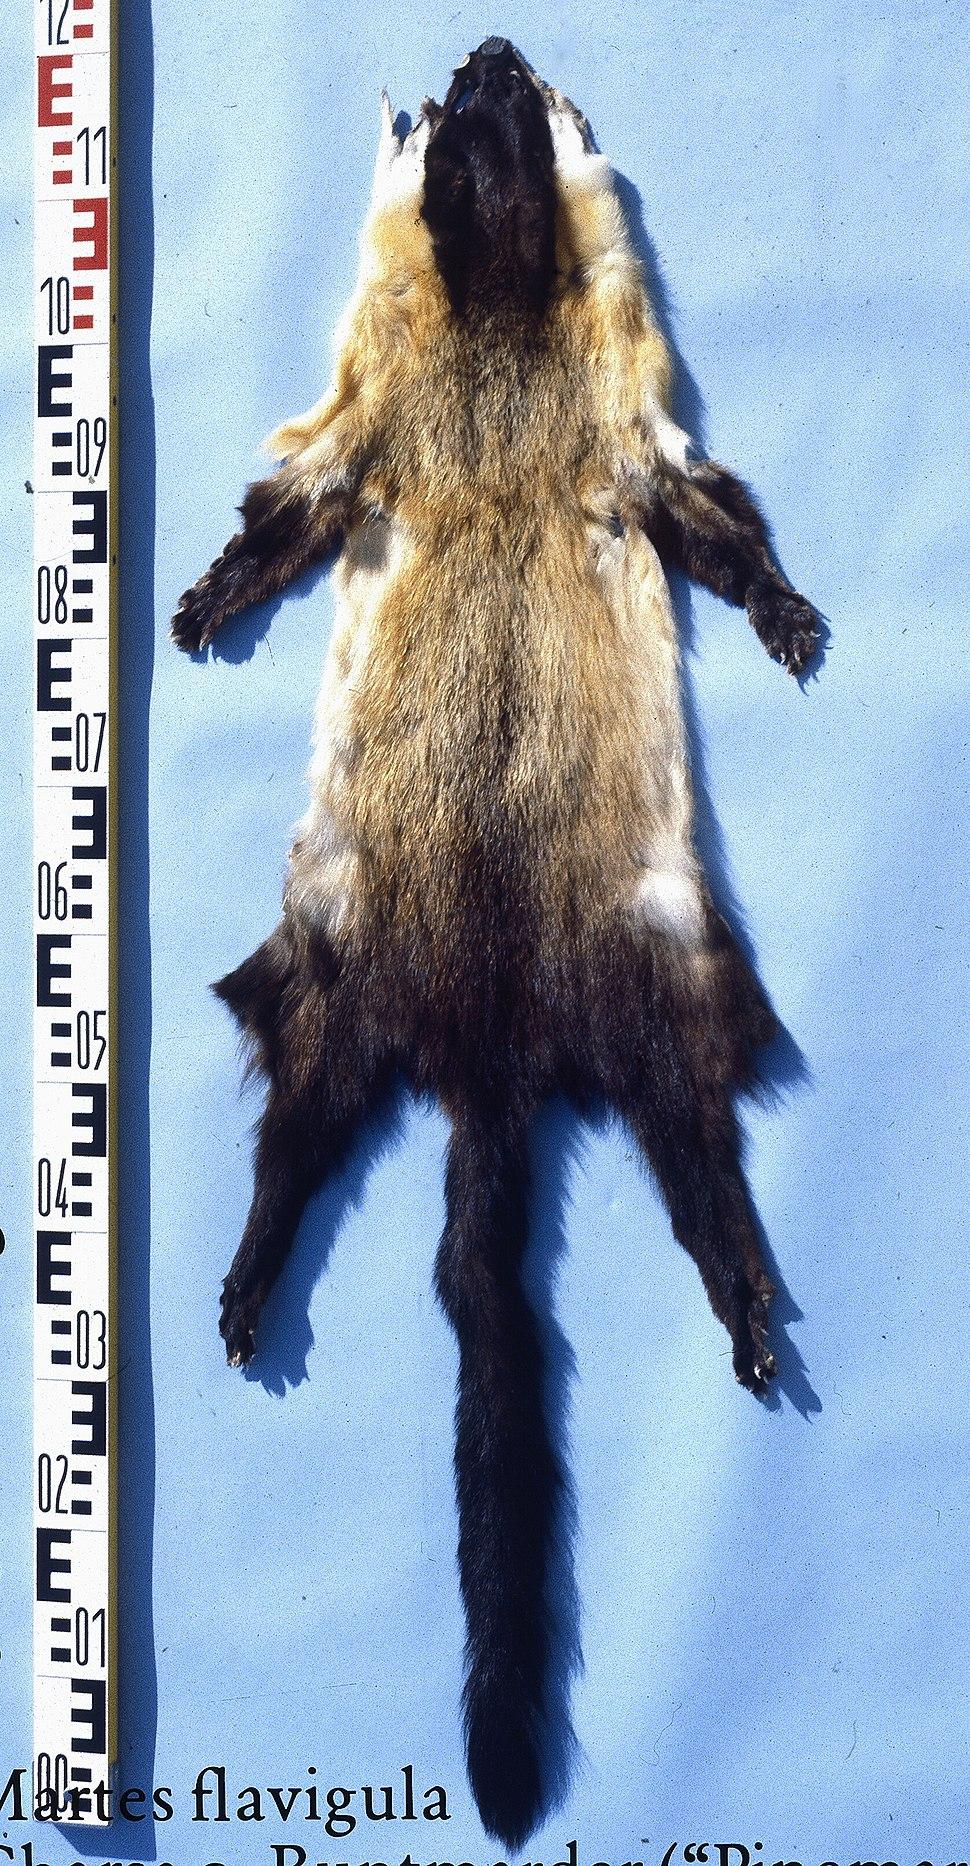 Martes flavigula (Indian marten) fur skin